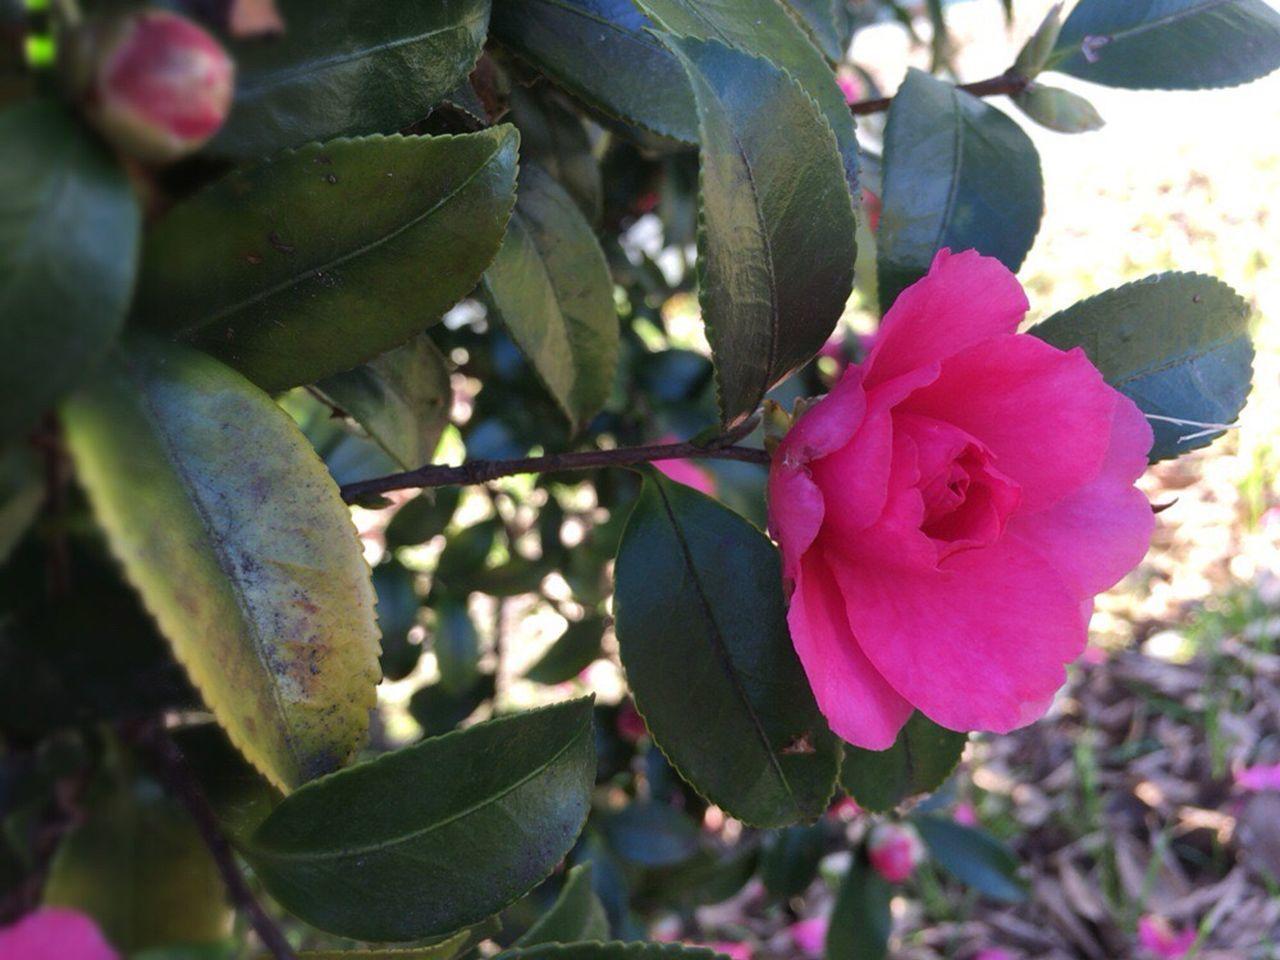 Kyoto December Kyoto City Kyoto Japan Camellia Sasanqua